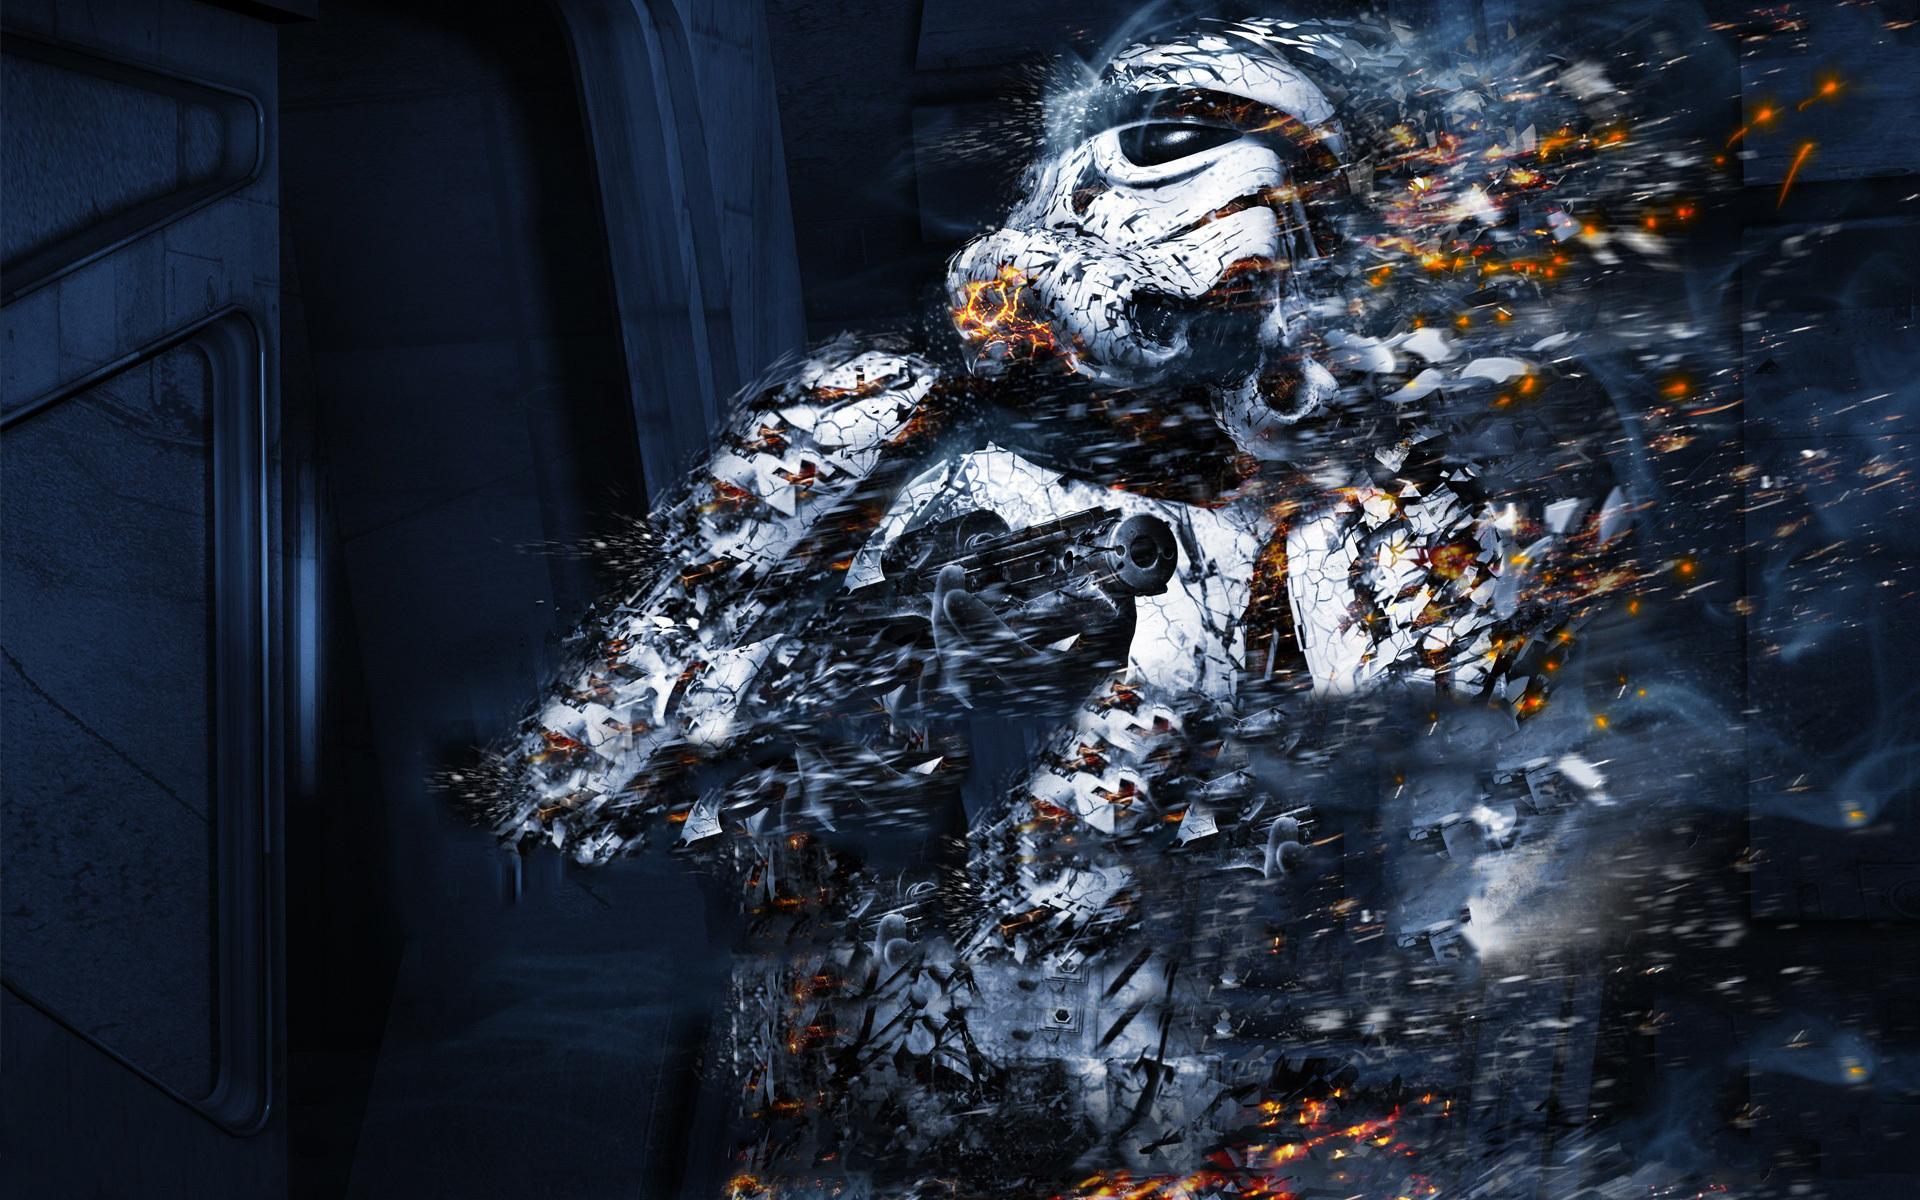 Sci Fi Clone : Star wars clone soldiers weapons ash sci fi movies